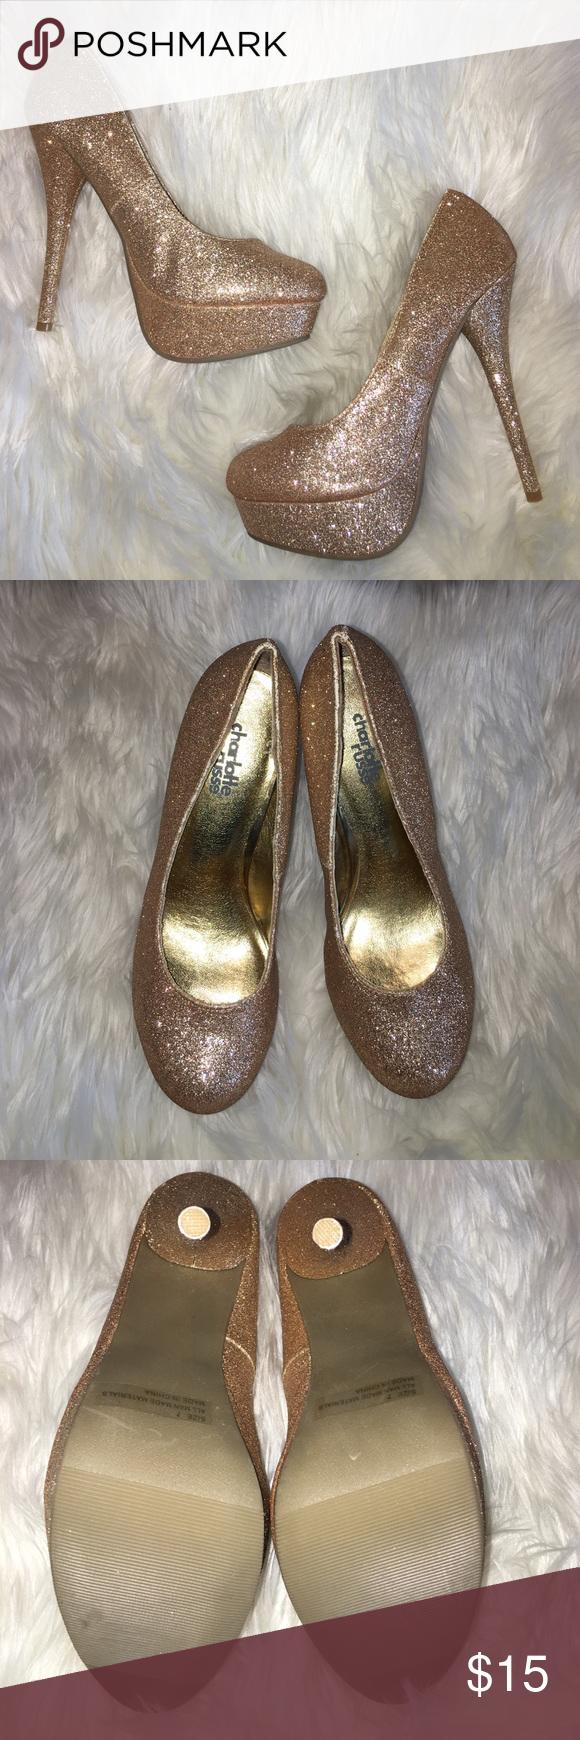 NEW✨ glitter heels New *no box* Charlotte Russe gold glitter heels - size 7 Charlotte Russe Shoes Heels